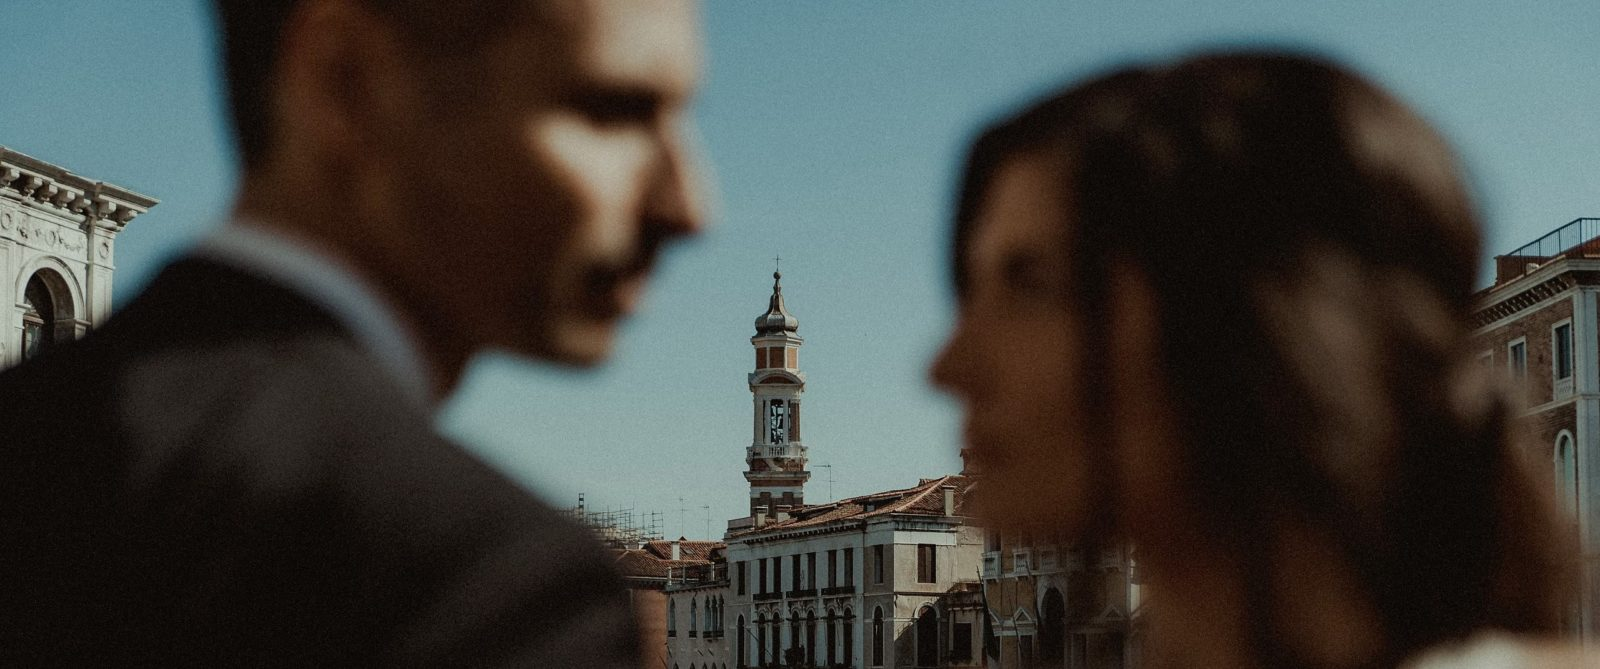 Venice Wedding Videographer filming wedding couple